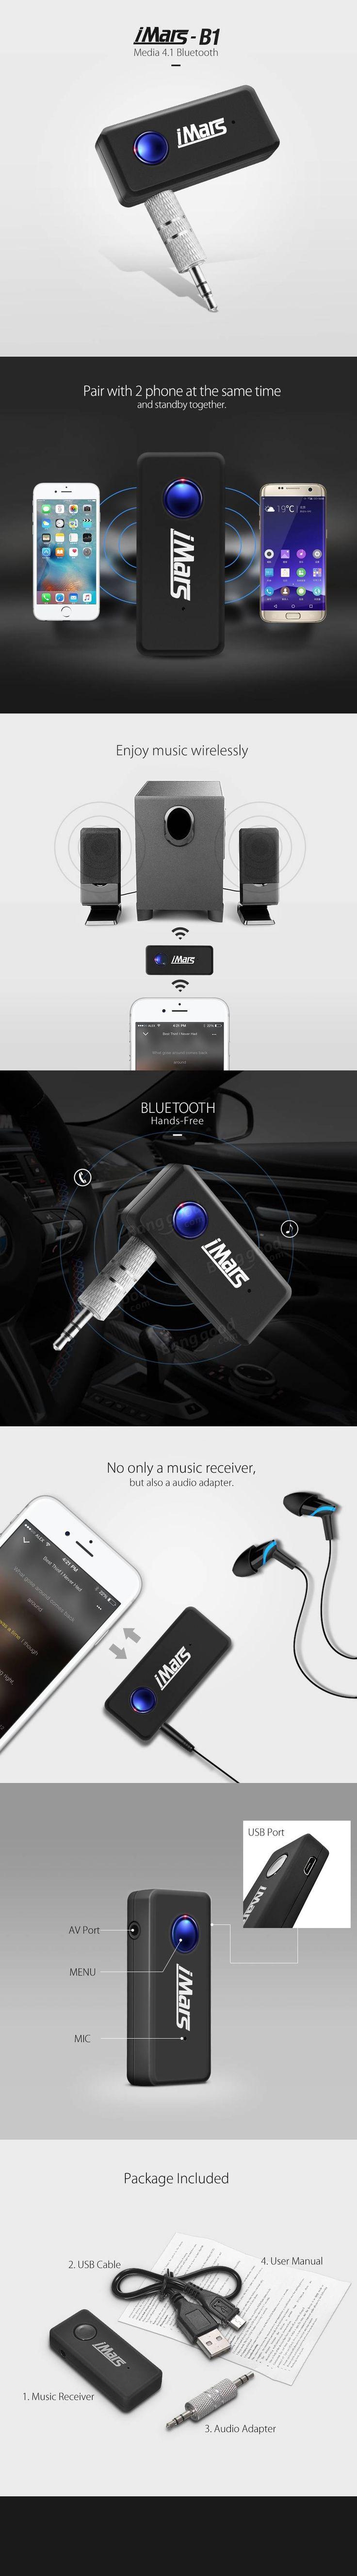 Imars b 1 kn311 airoha4 1 car bluetooth music receiver hands free stereo